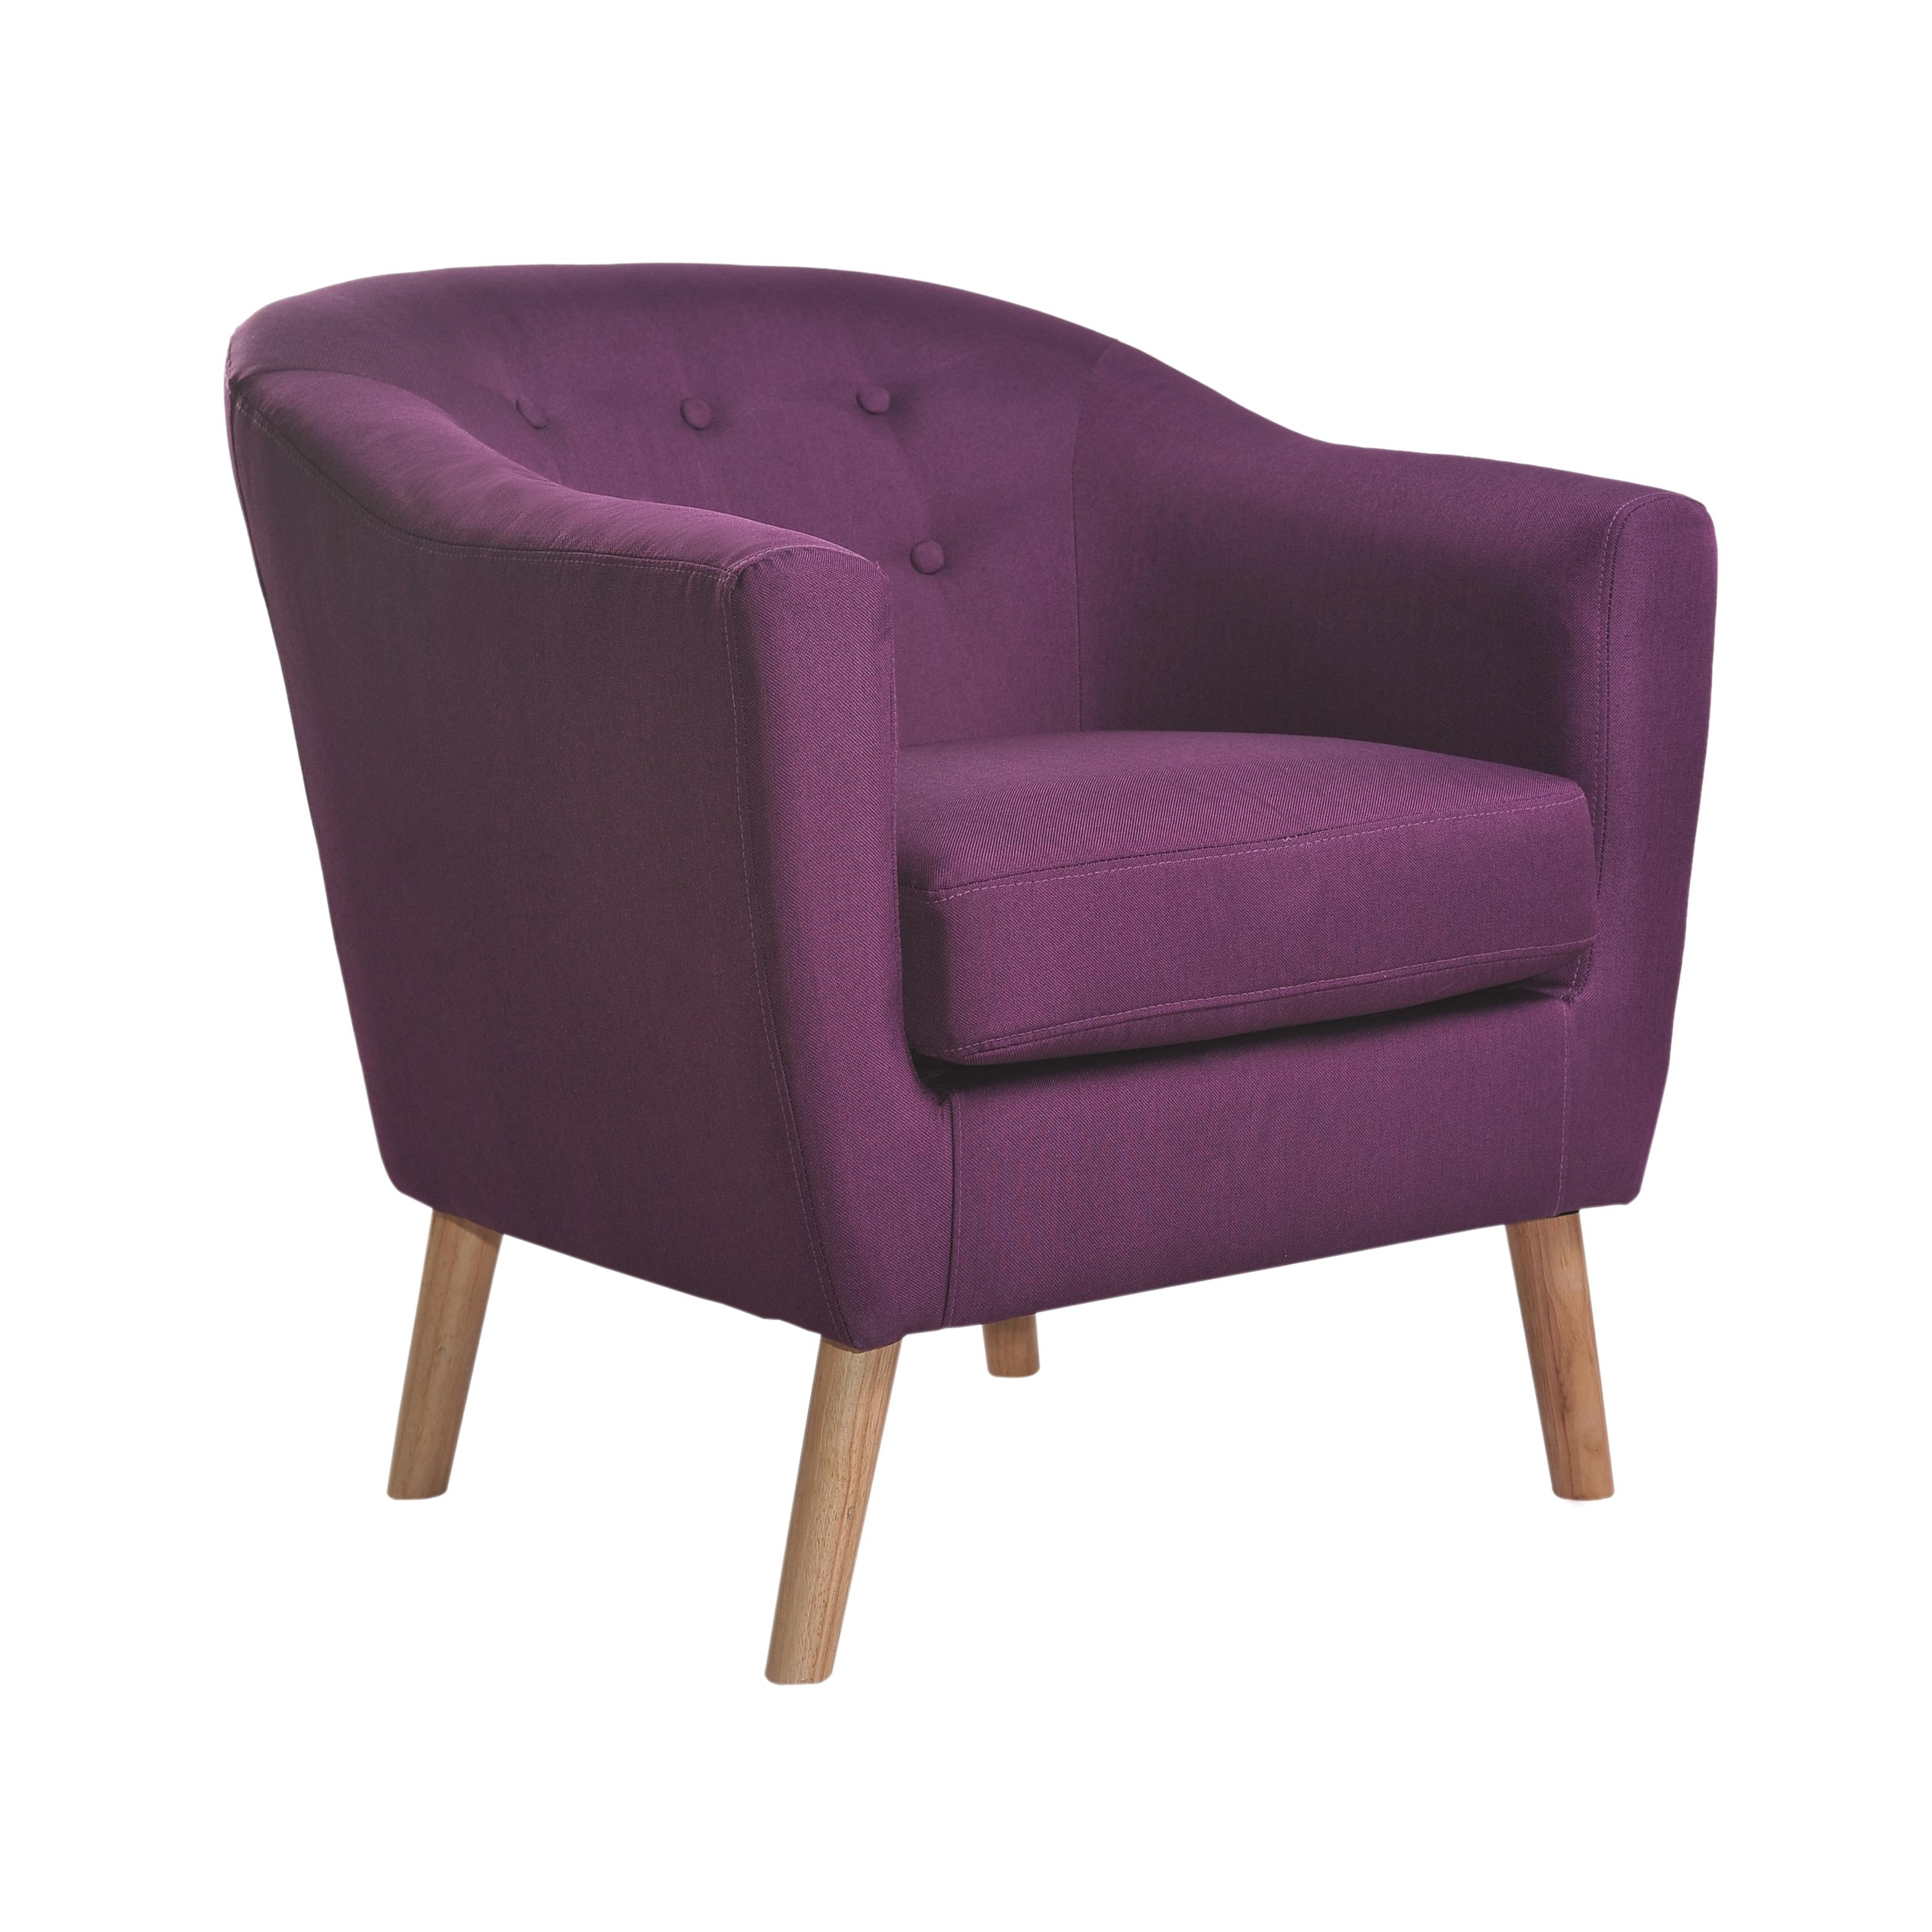 Nathaniel Home Jason Mid Century Purple Club Chair